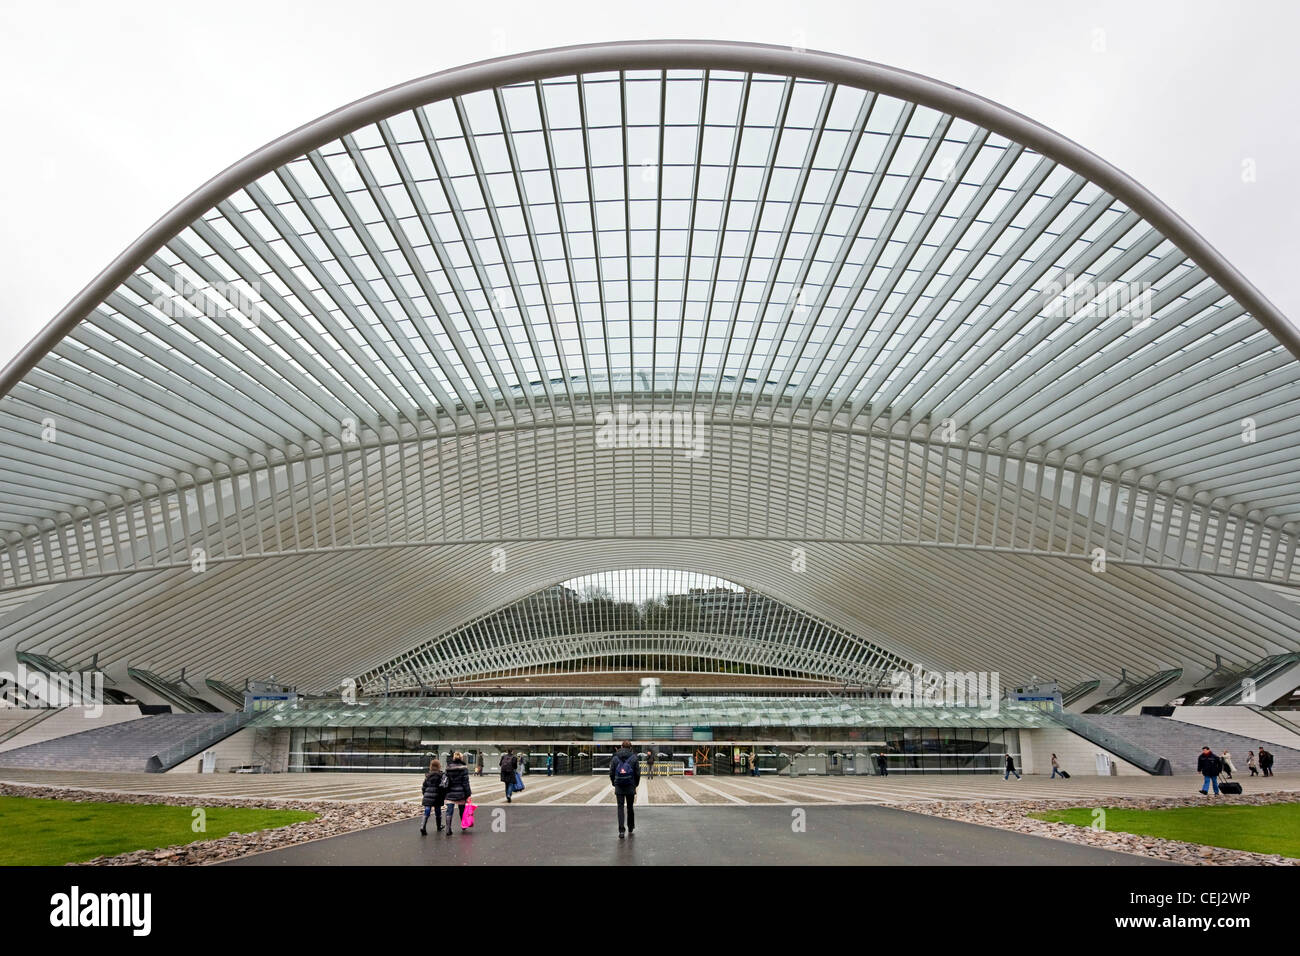 Entrance of the Liège-Guillemins train station at Liège, Belgium - Stock Image